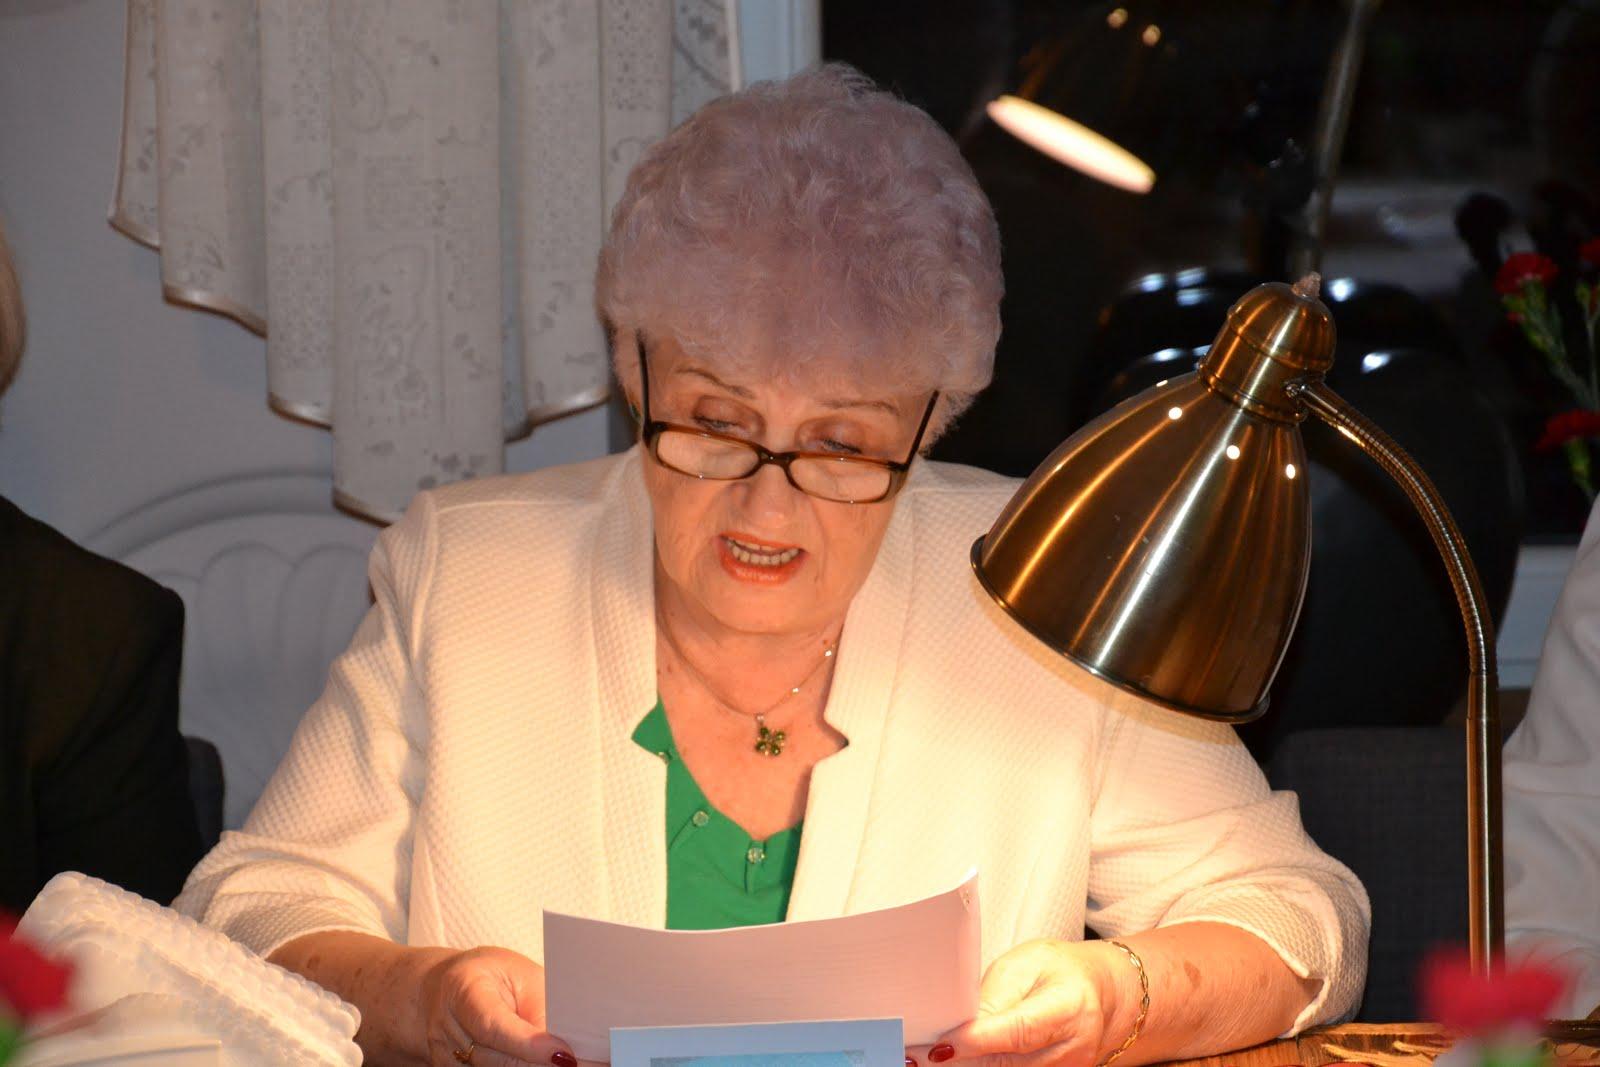 Ania Paprocka